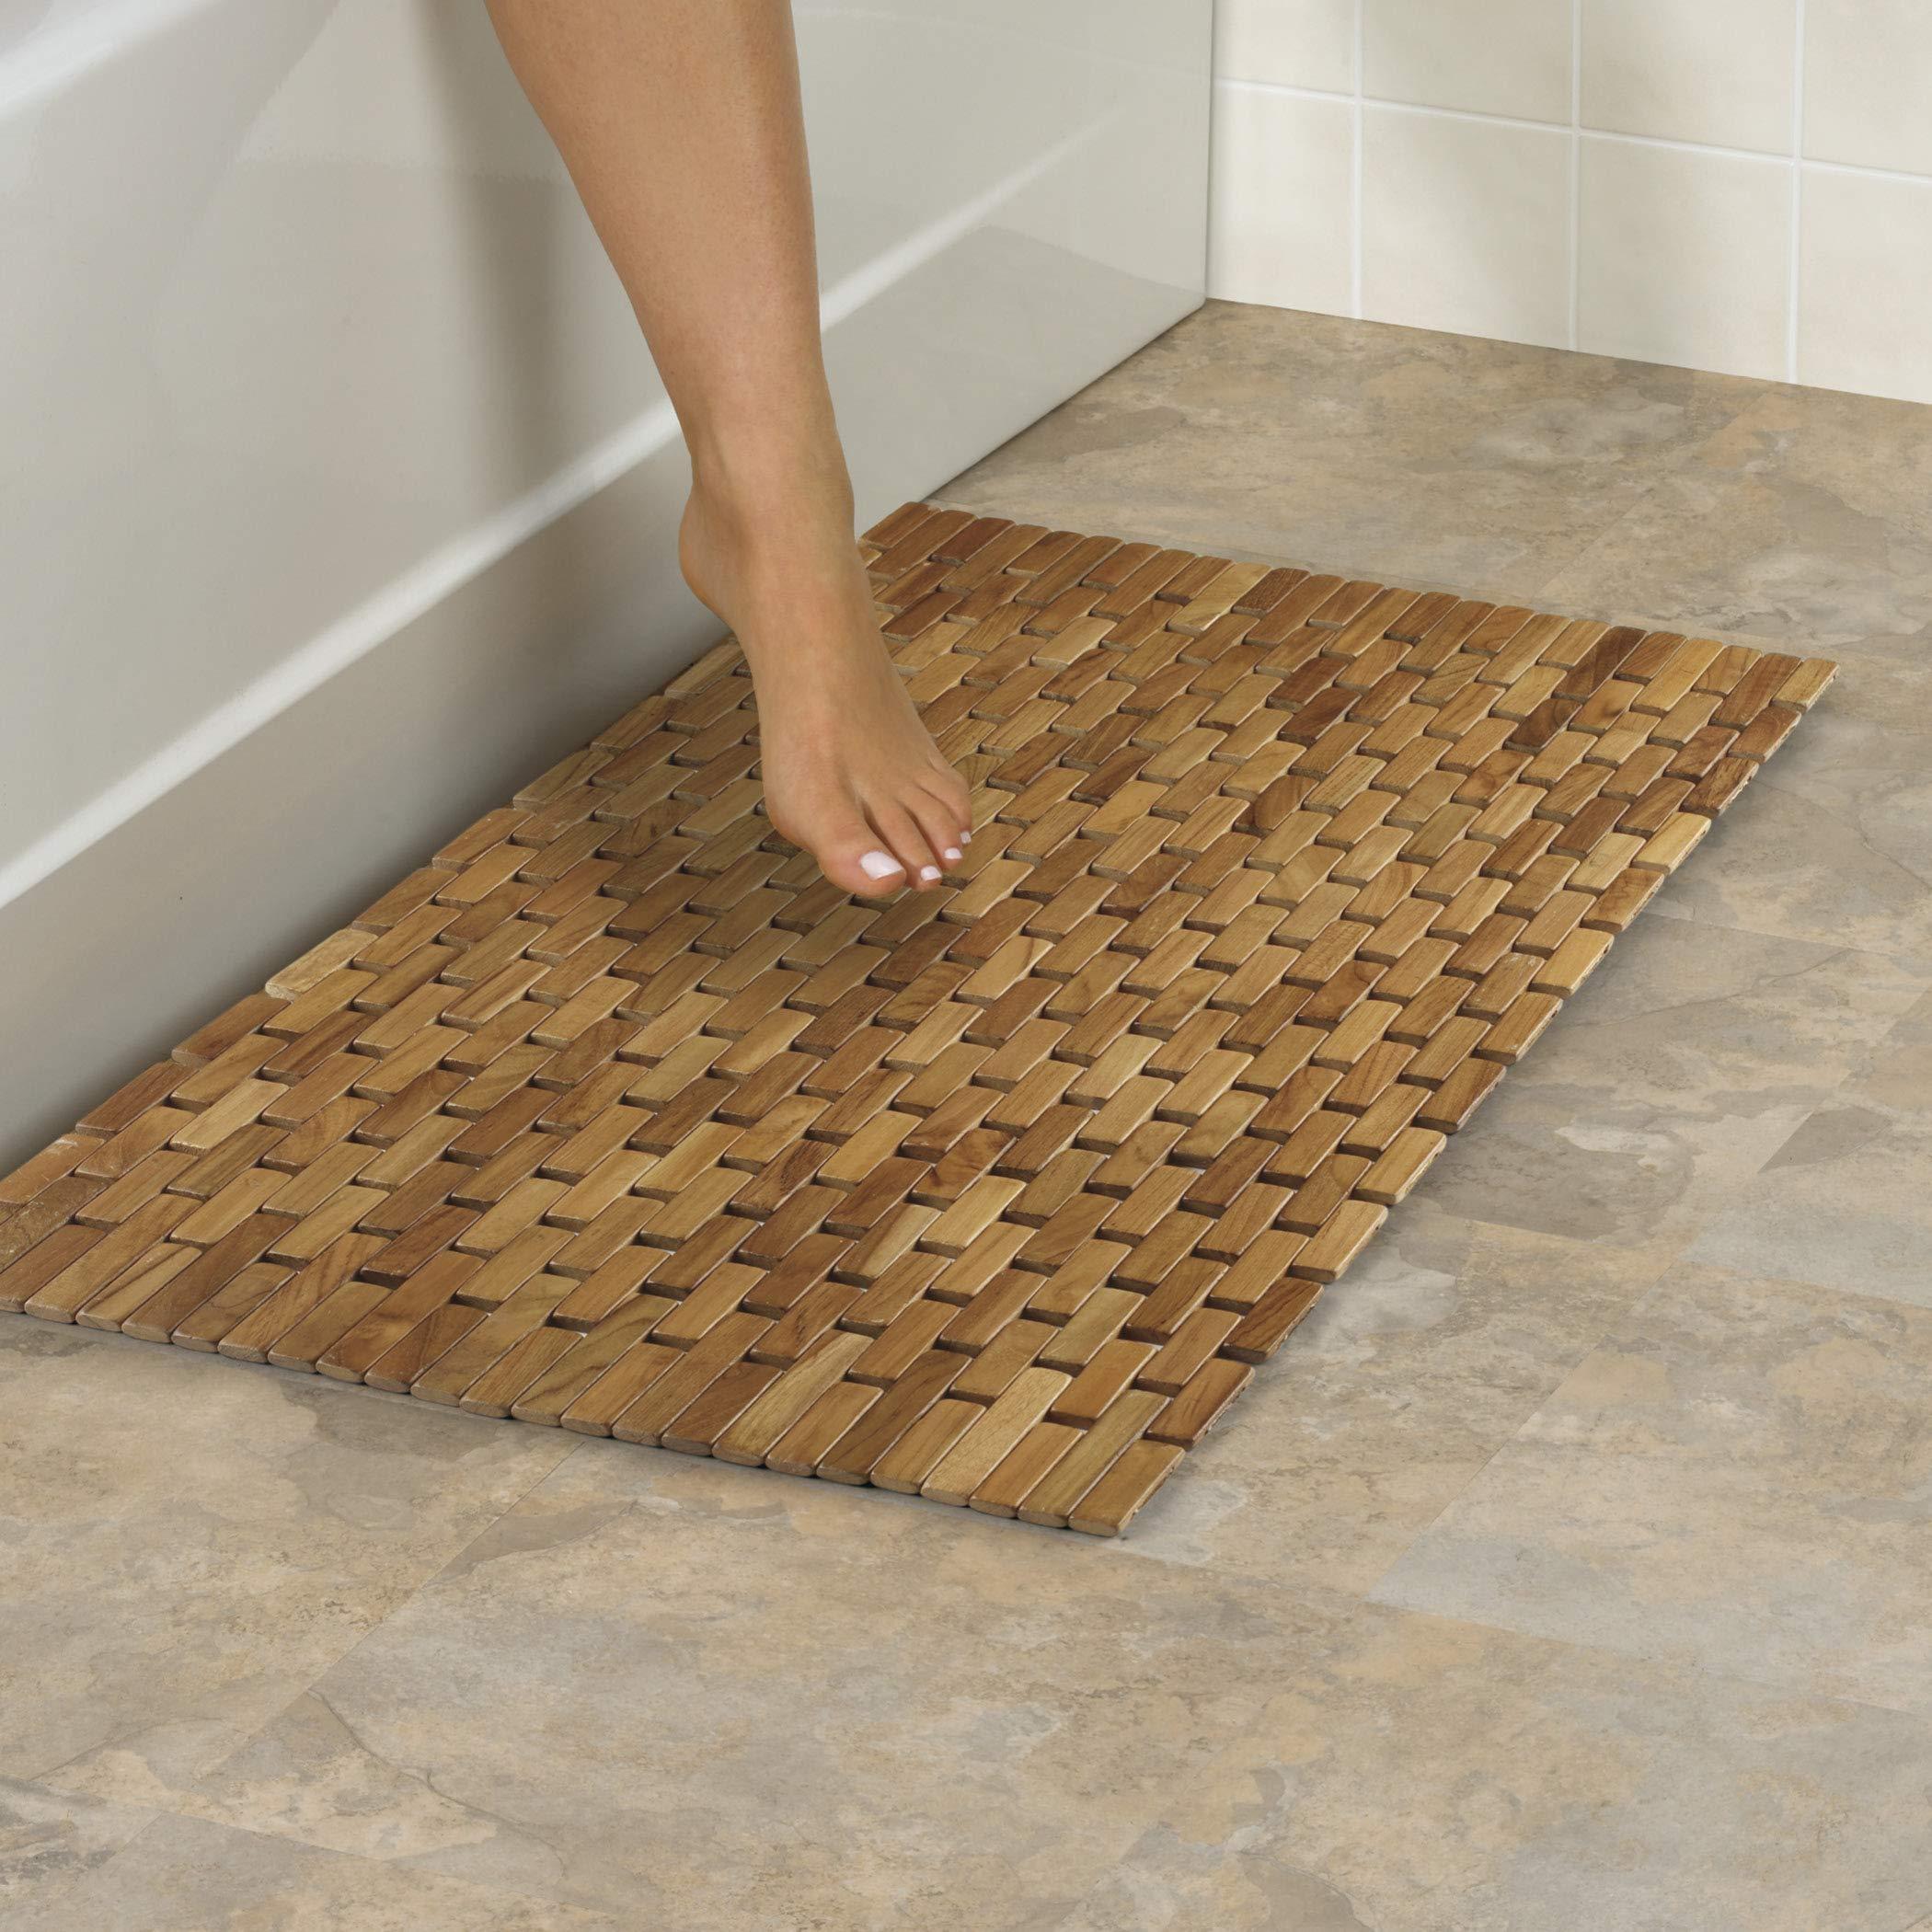 Conair Home Teak Spa Mat, Roll-Up or Lay Flat by Conair (Image #2)